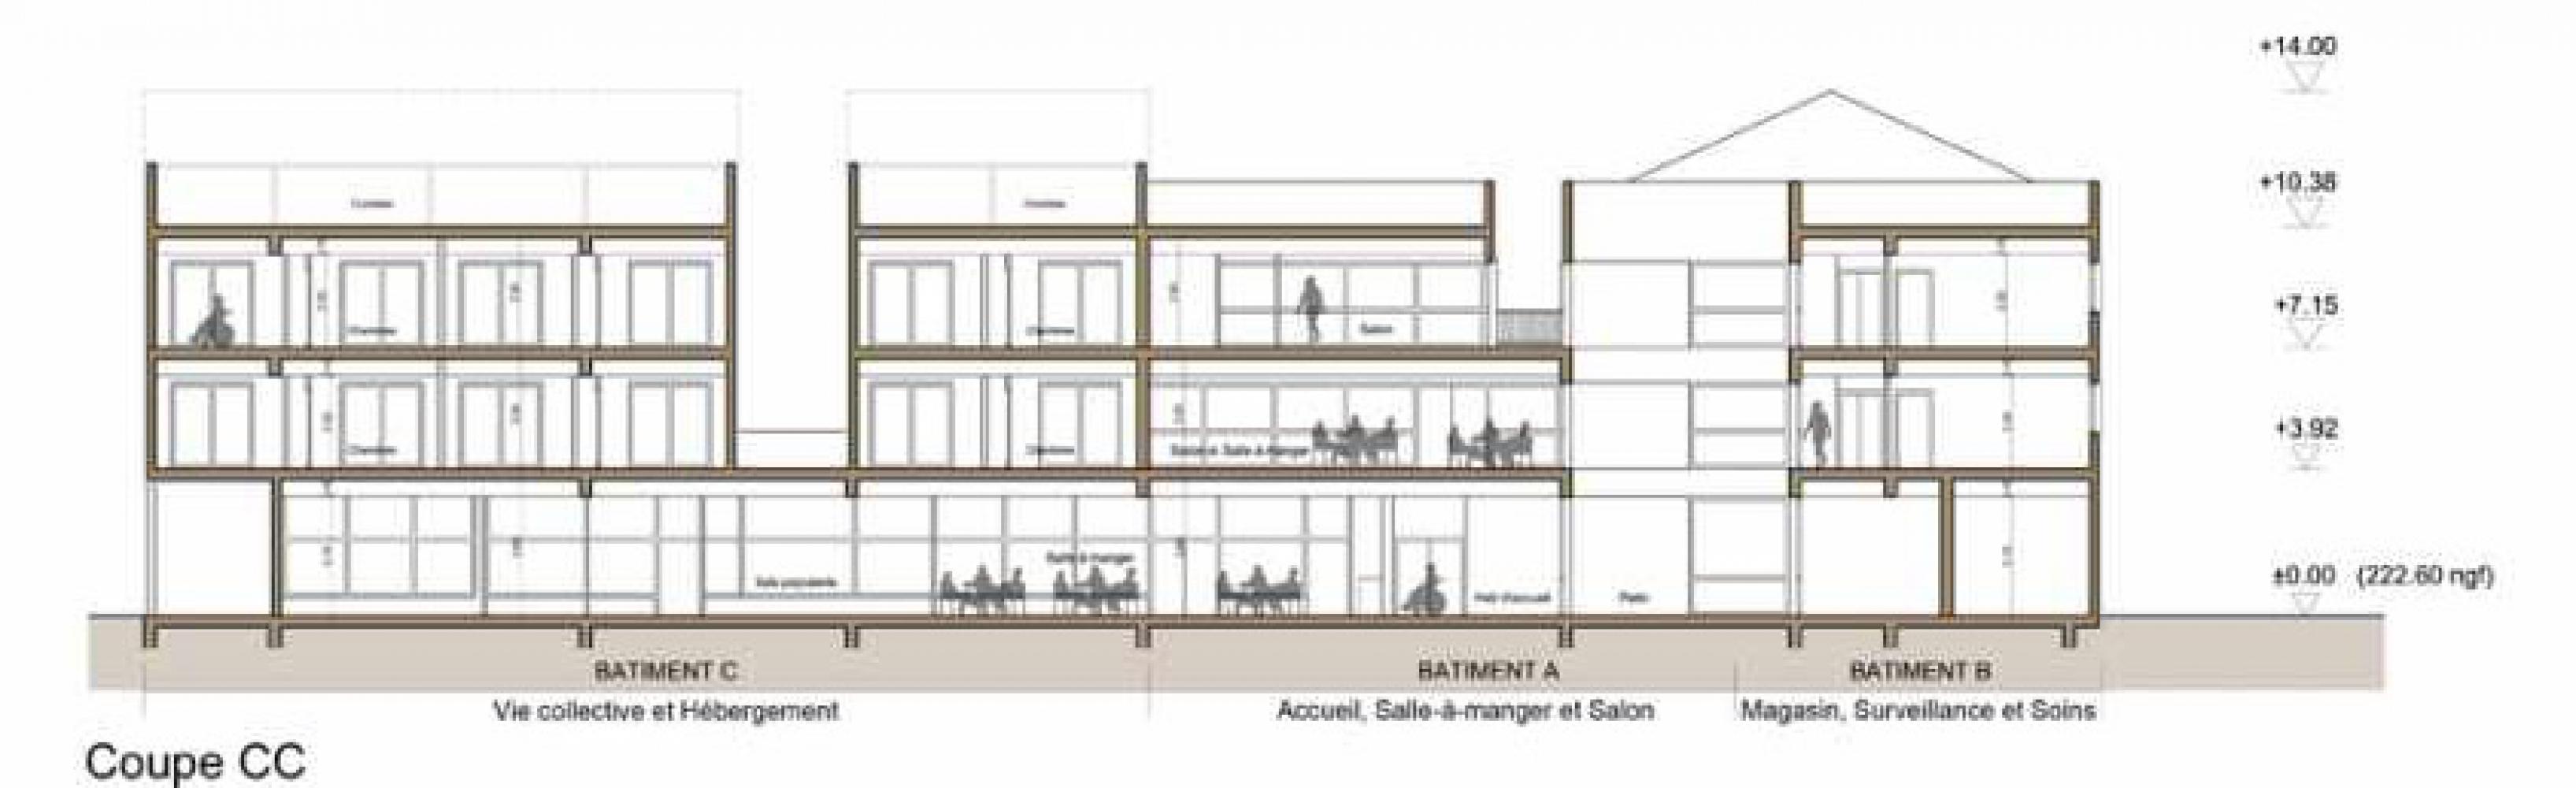 coupe_cc Pascale SEURIN Architecte - Médico-Social